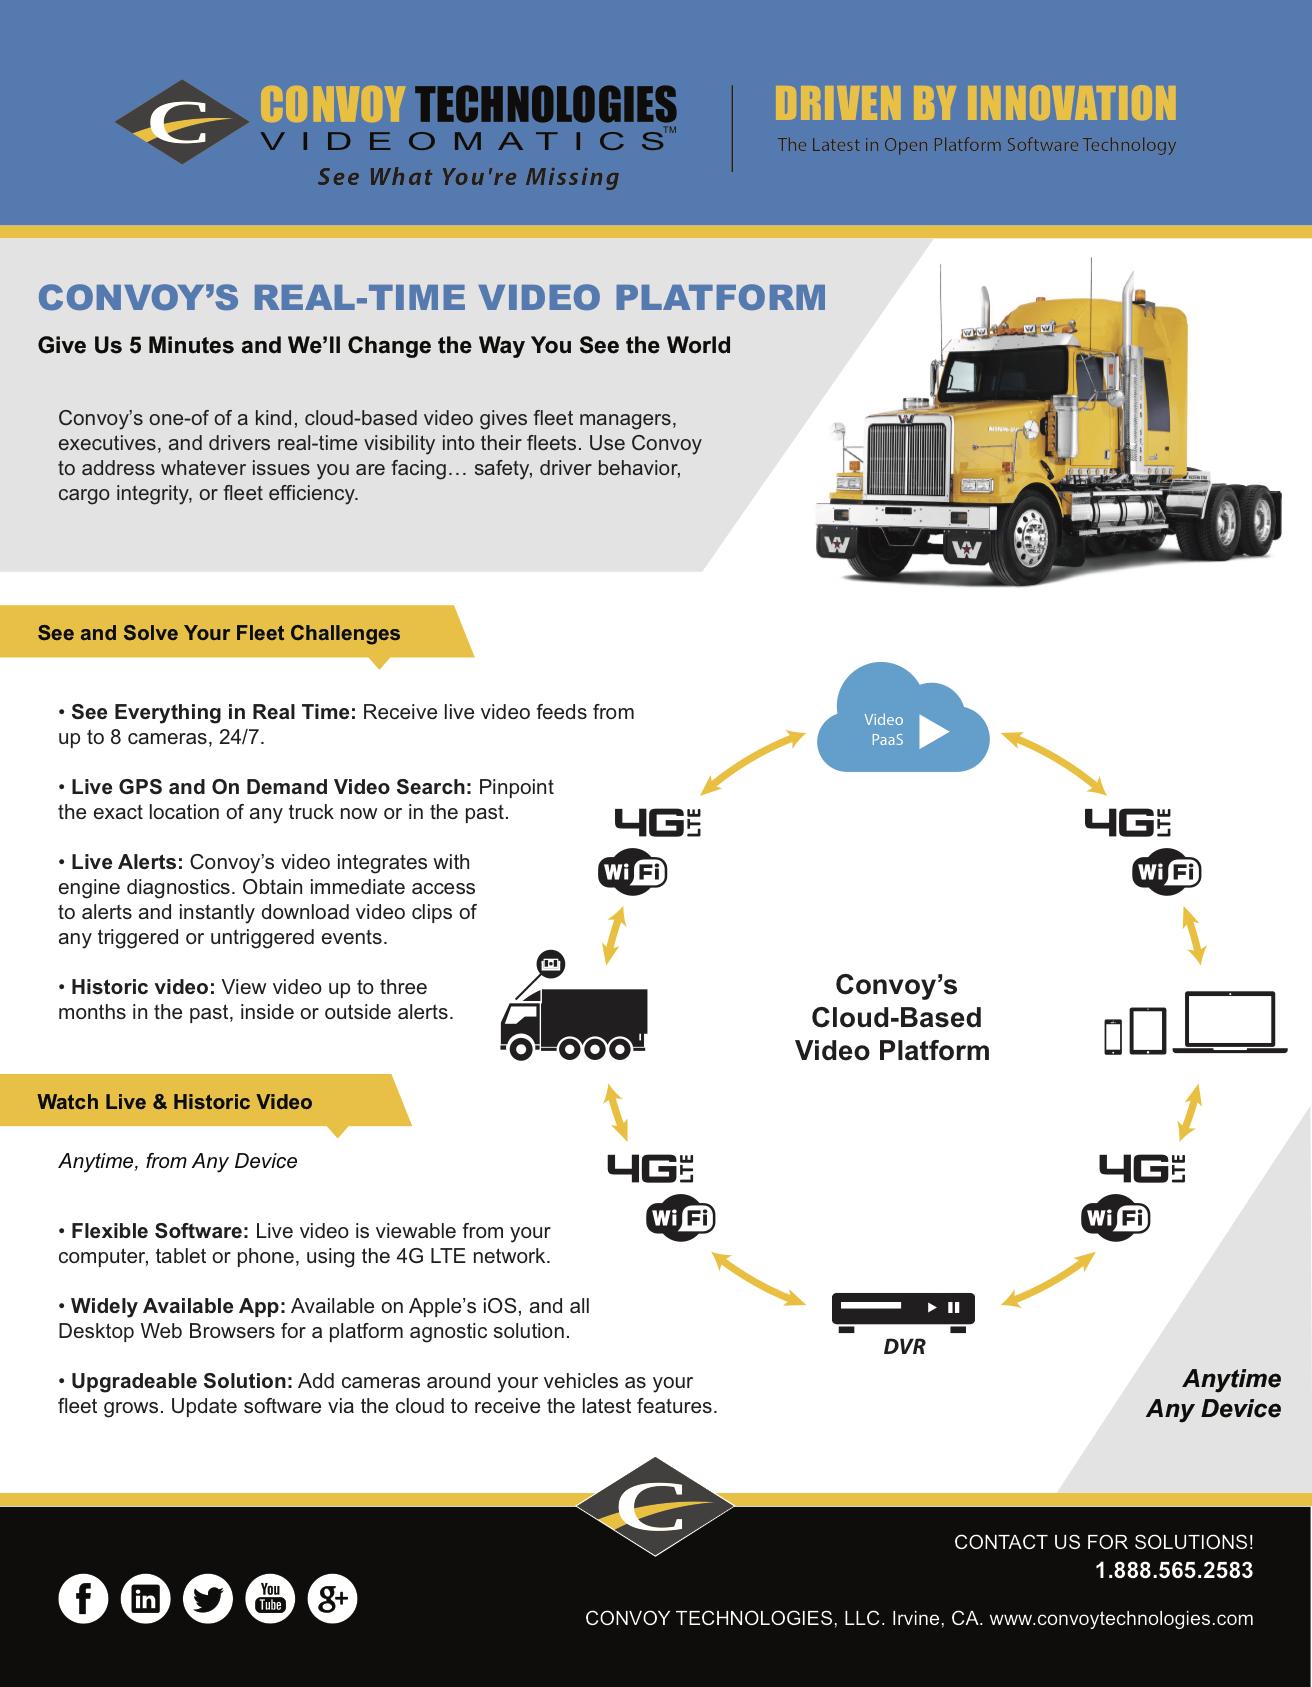 Videomatics Video PaaS Overview